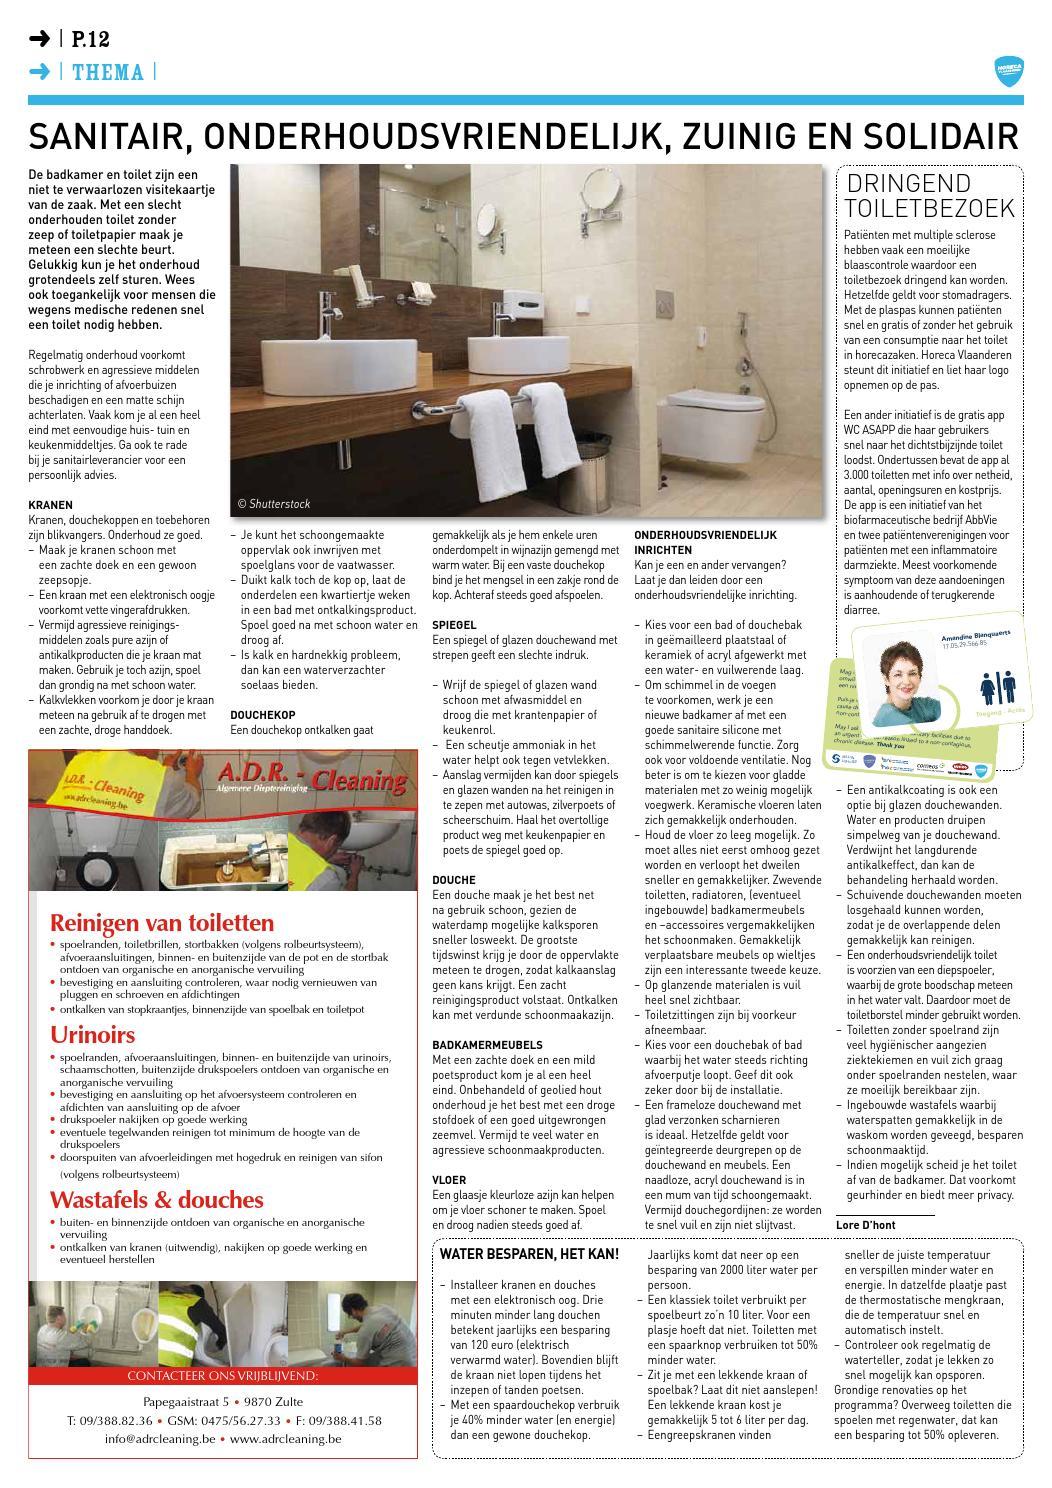 Kalk In De Wc Pot.Horeca Krant N 77 Juni 2016 By Elma Multimedia Issuu